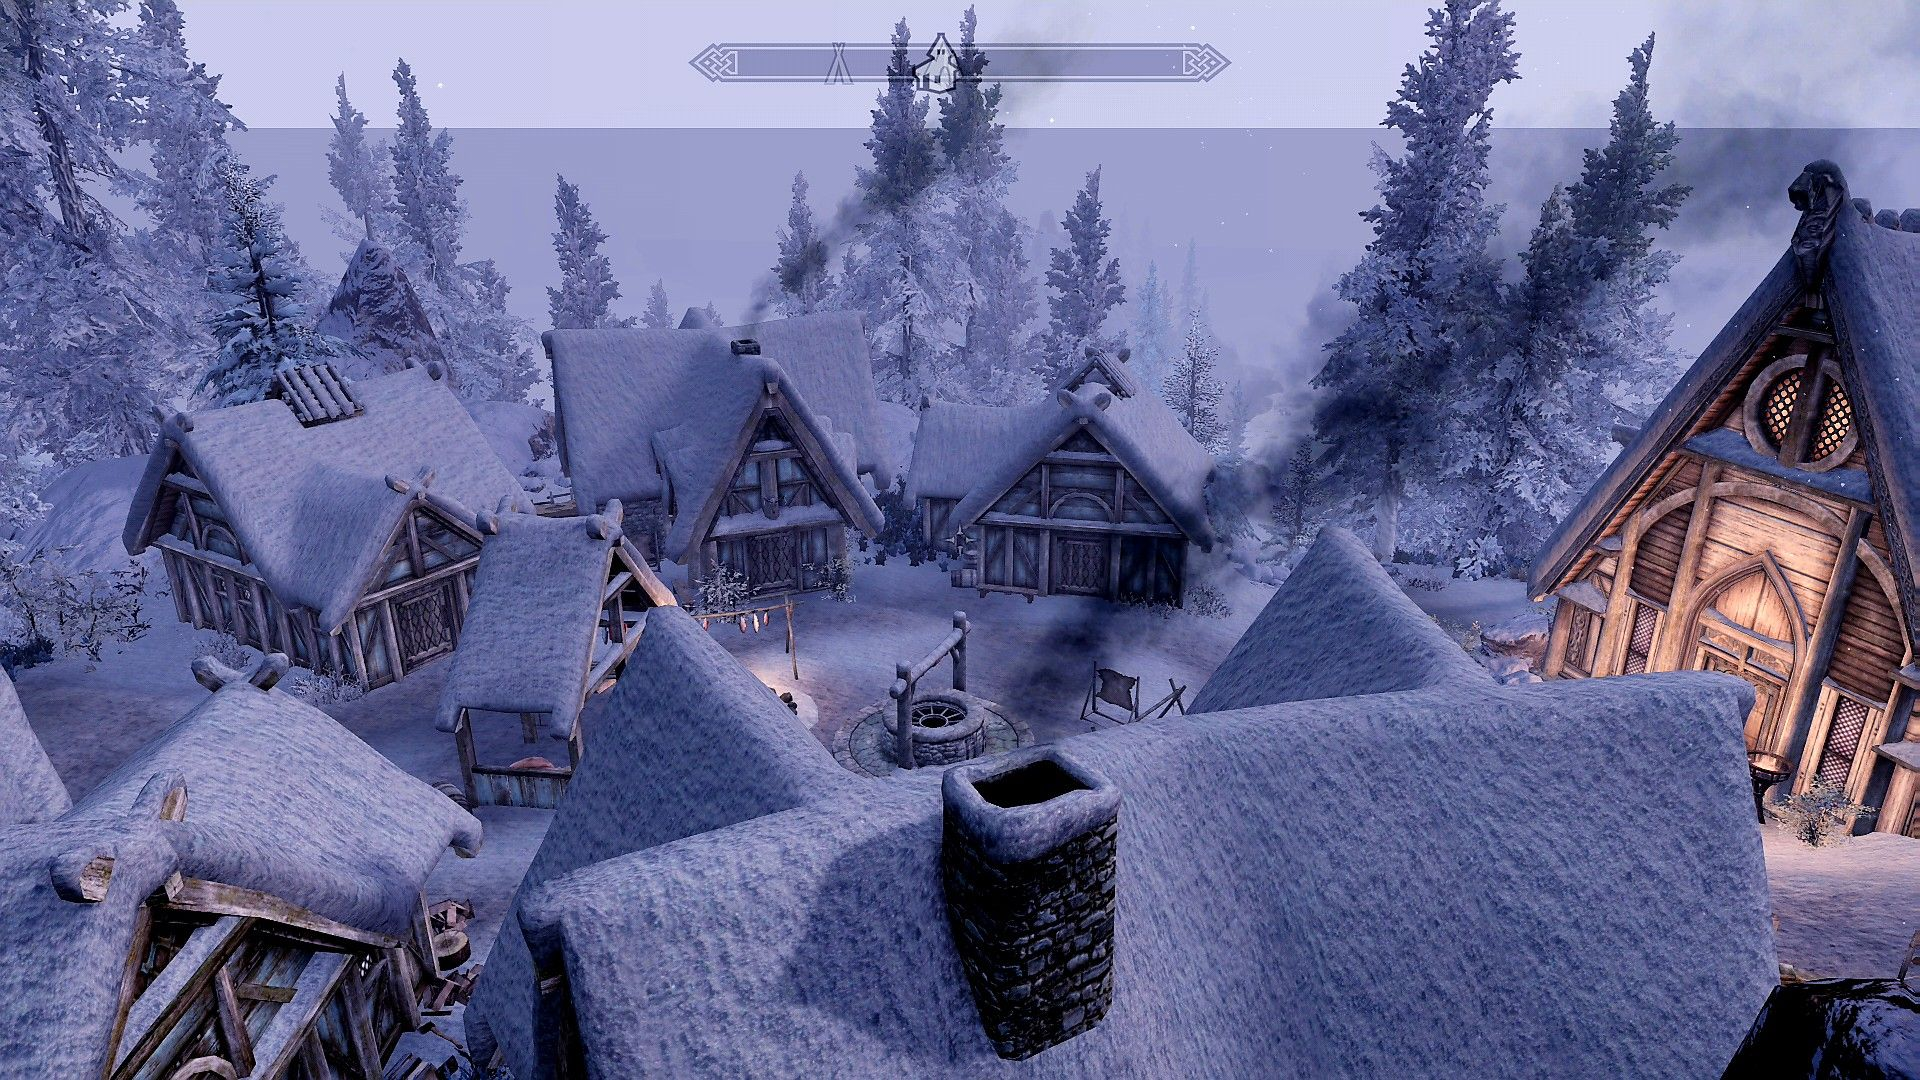 Skyrim Embla Ysmir Ericsdotter at the Skaal village in